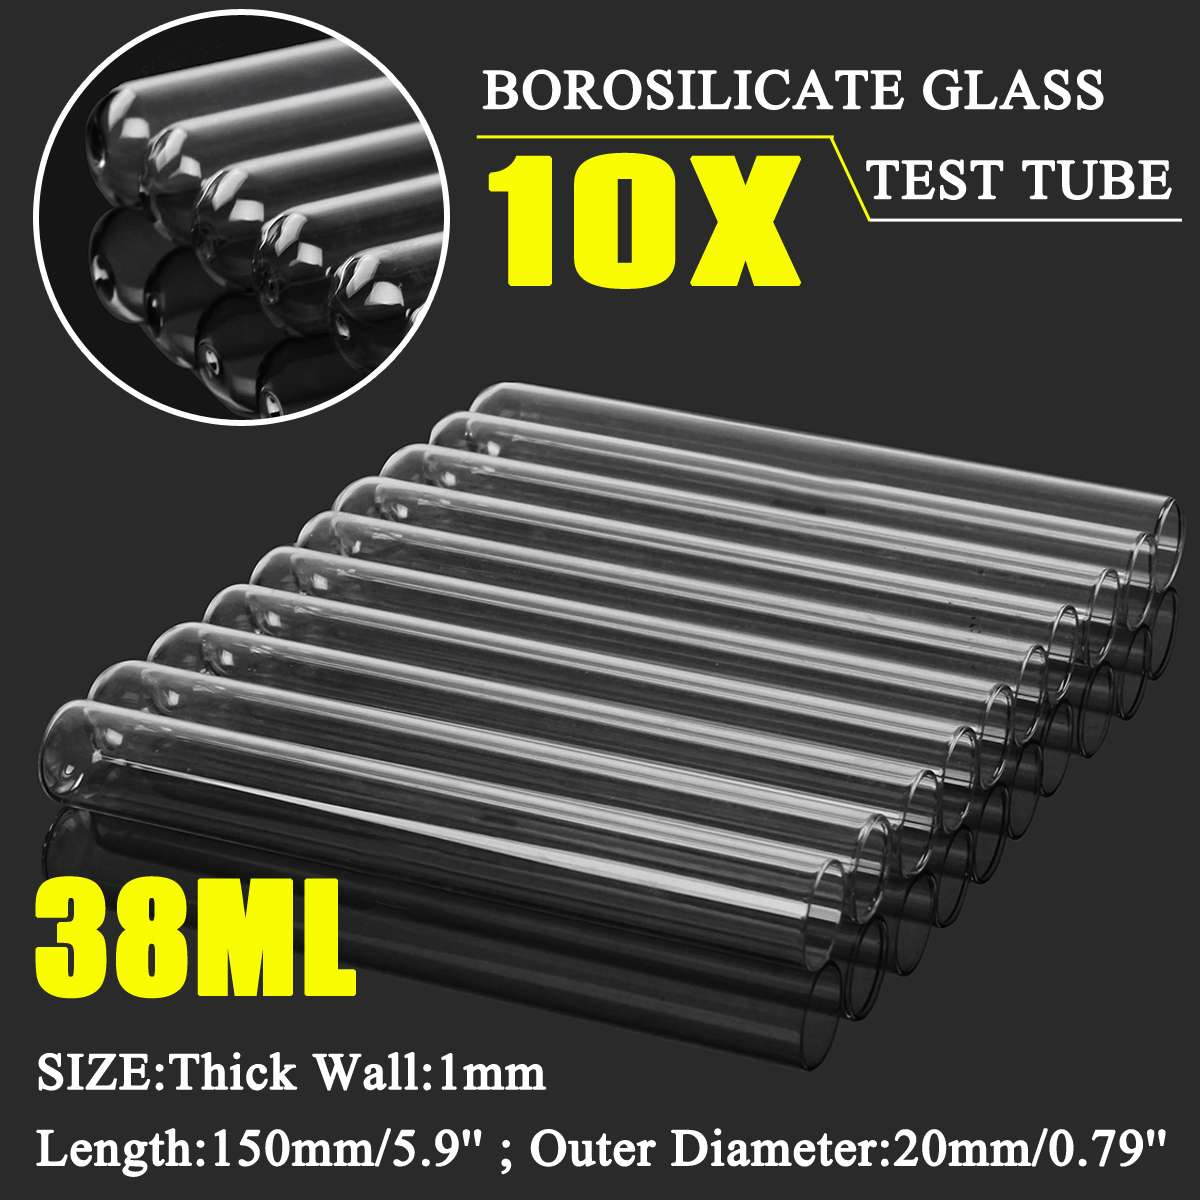 KICUTE Borosilicate Glass Test Tube 10Pcs 20x150mm Tubing Blowing Pyrex Tubes 38mL Thick Blowing Tube Lab Tubing School Factory